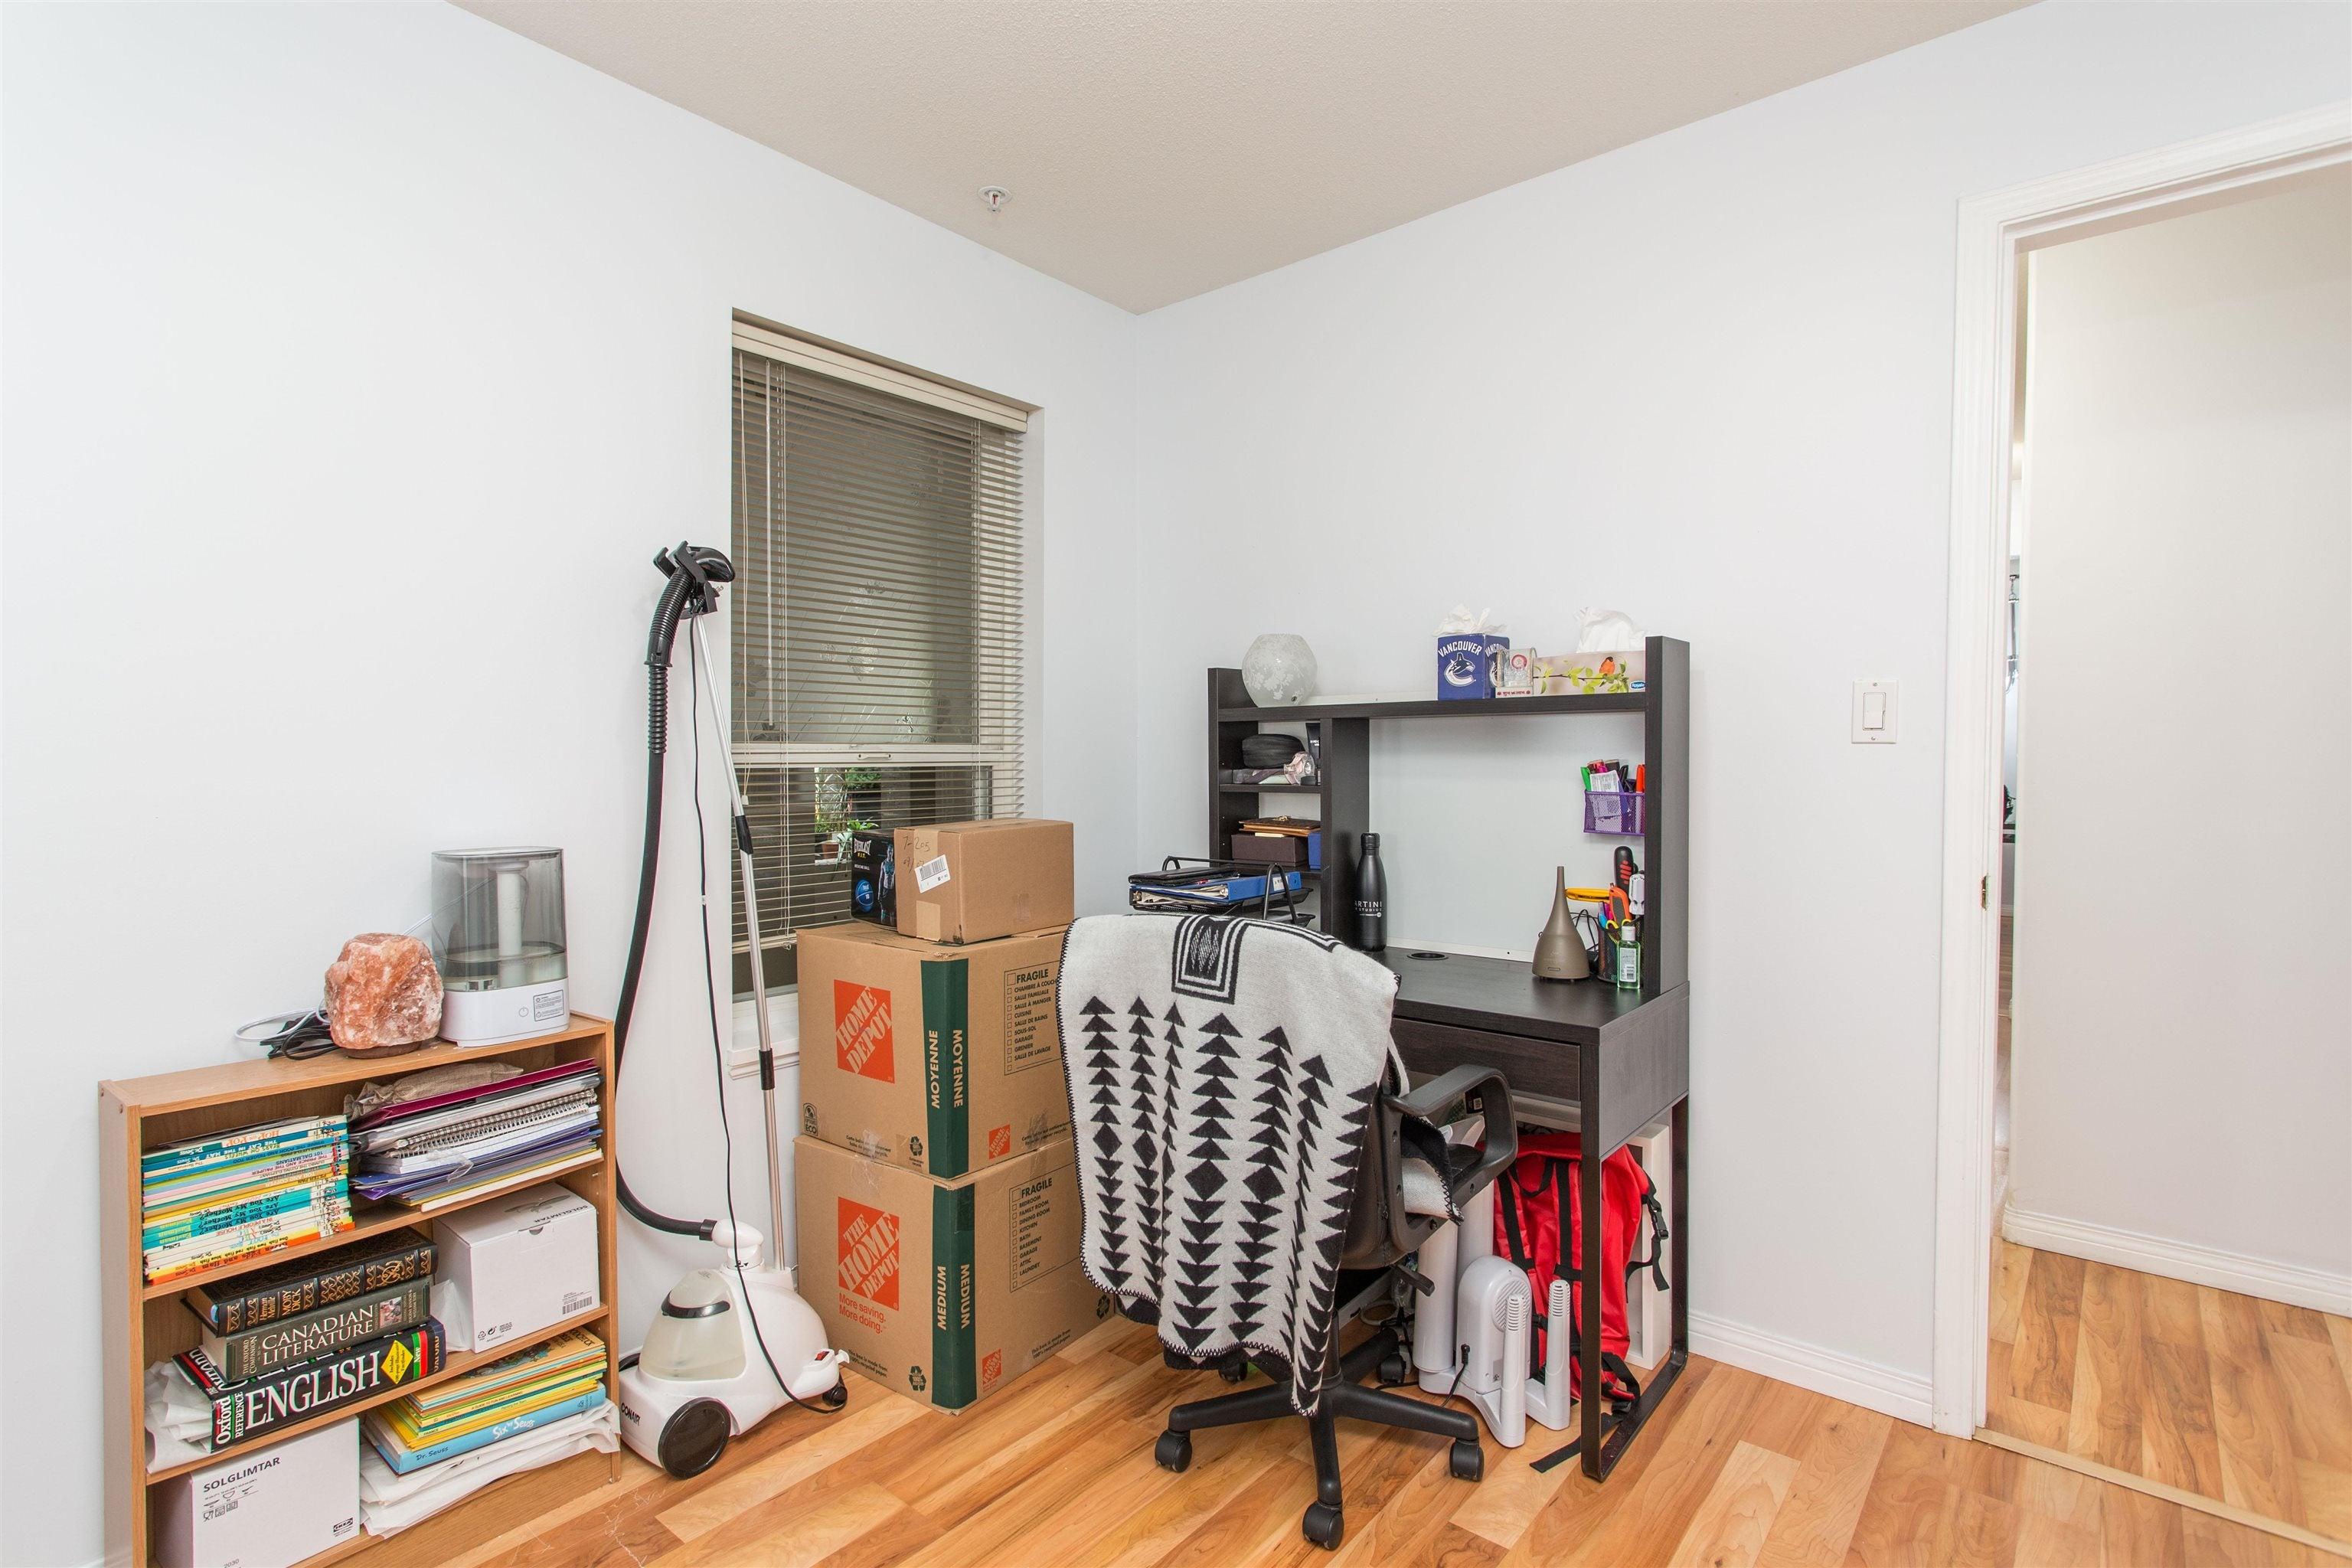 7 205 LEBLEU STREET - Maillardville Apartment/Condo for sale, 3 Bedrooms (R2625671) - #20